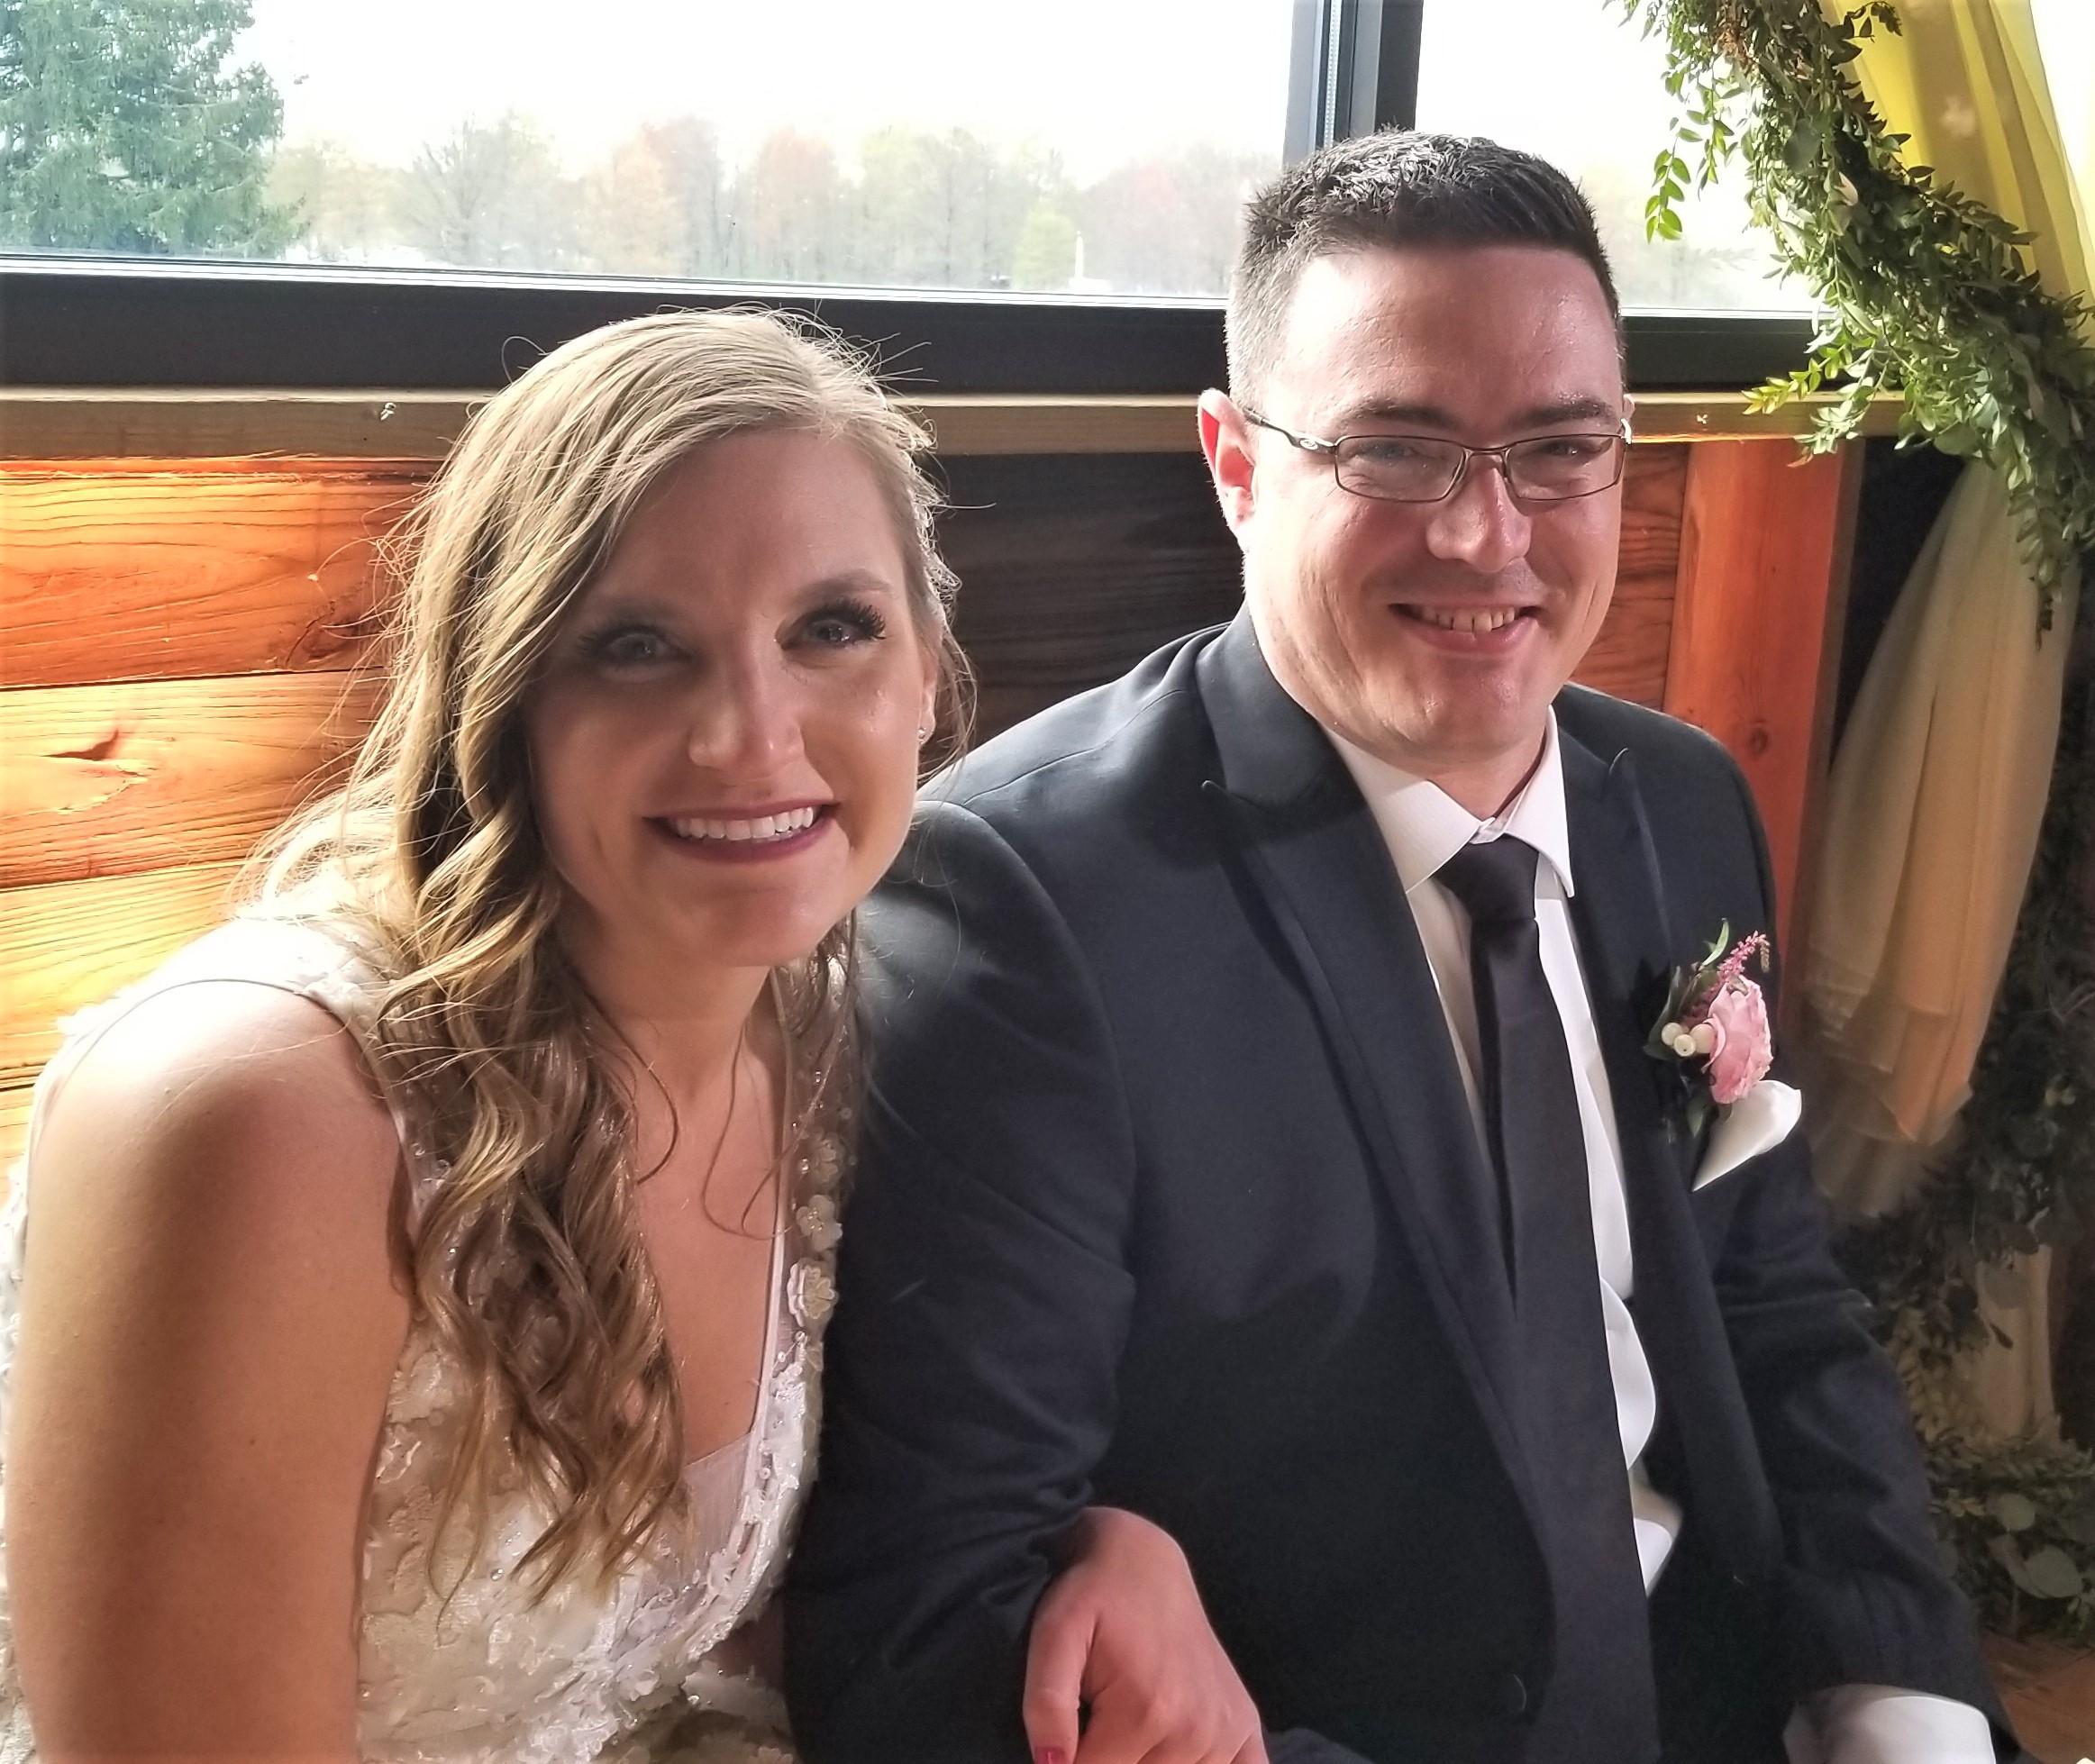 The happy couple: Tara and Tim